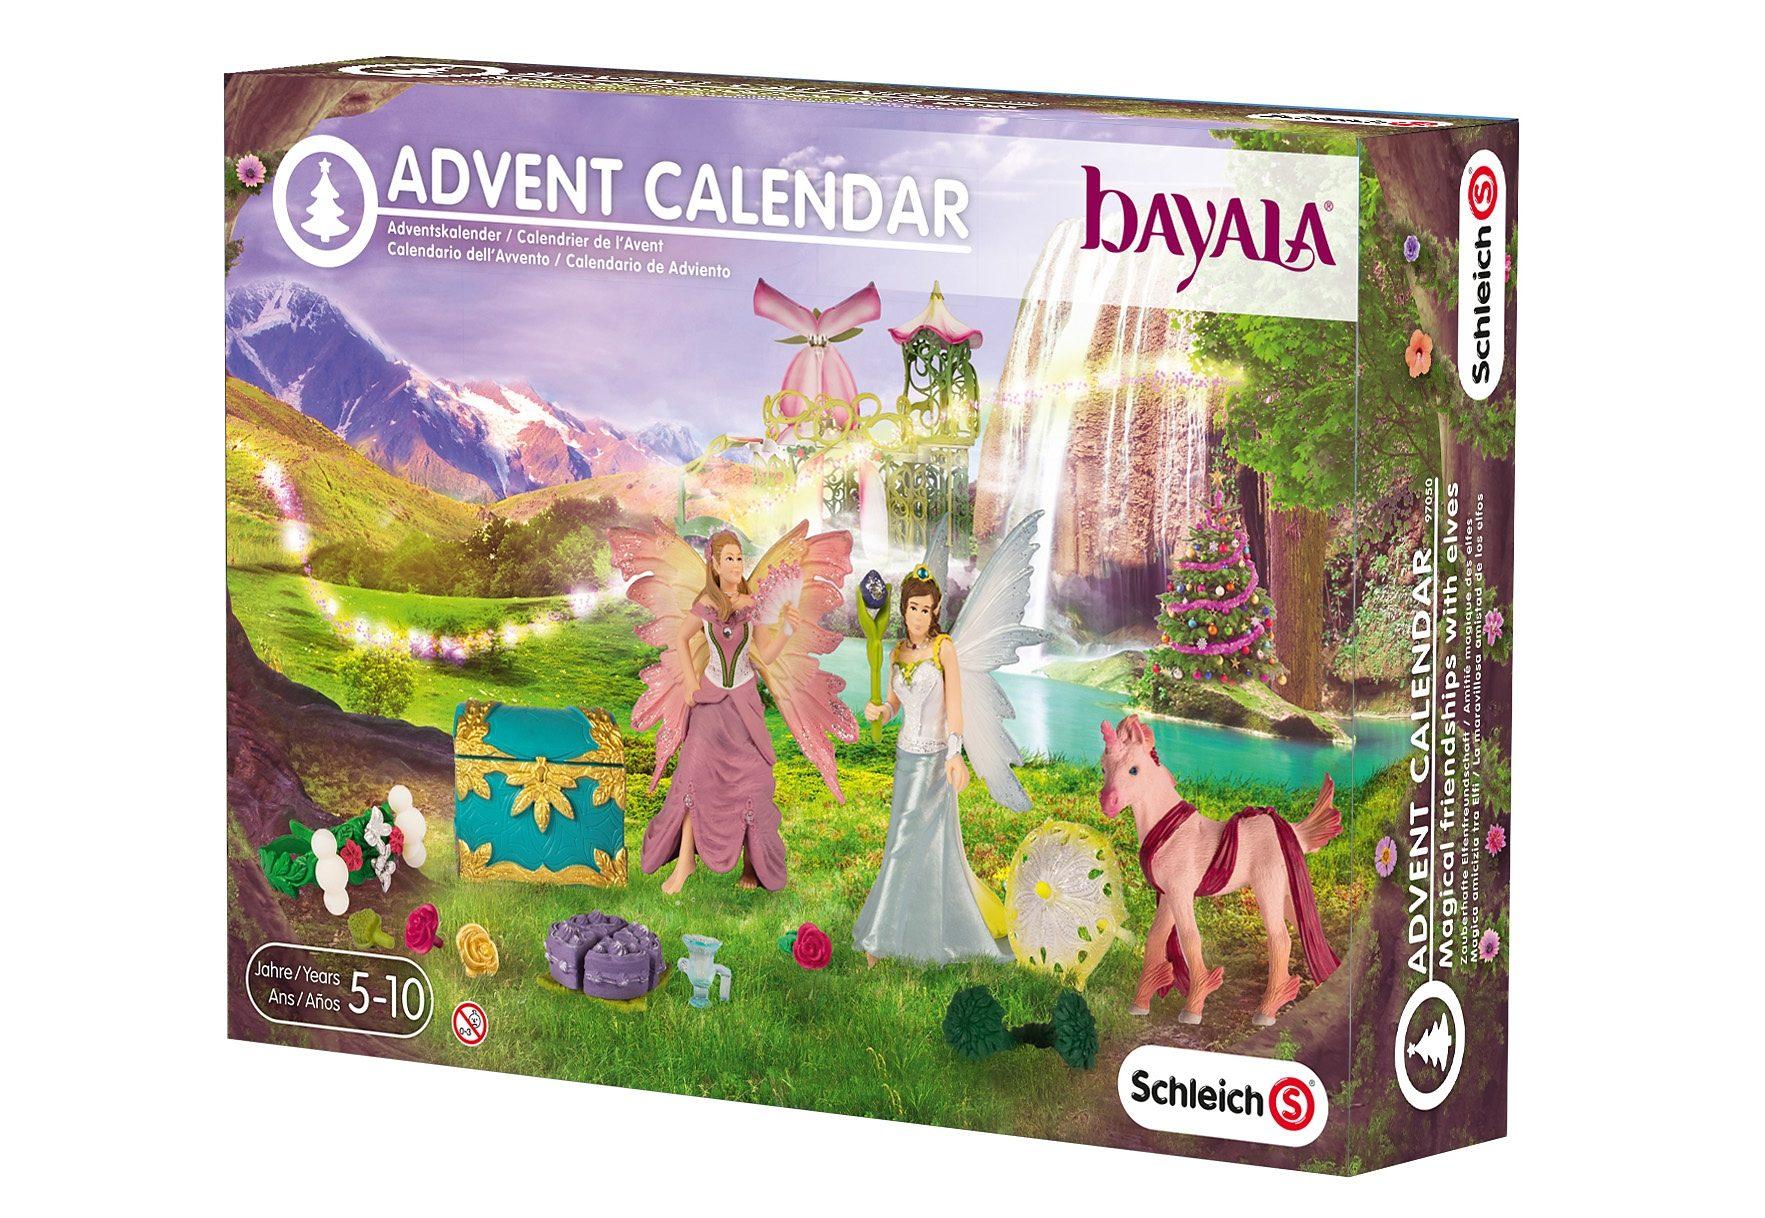 Schleich® Adventskalender (97050), »Adventskalender bayala 2015«